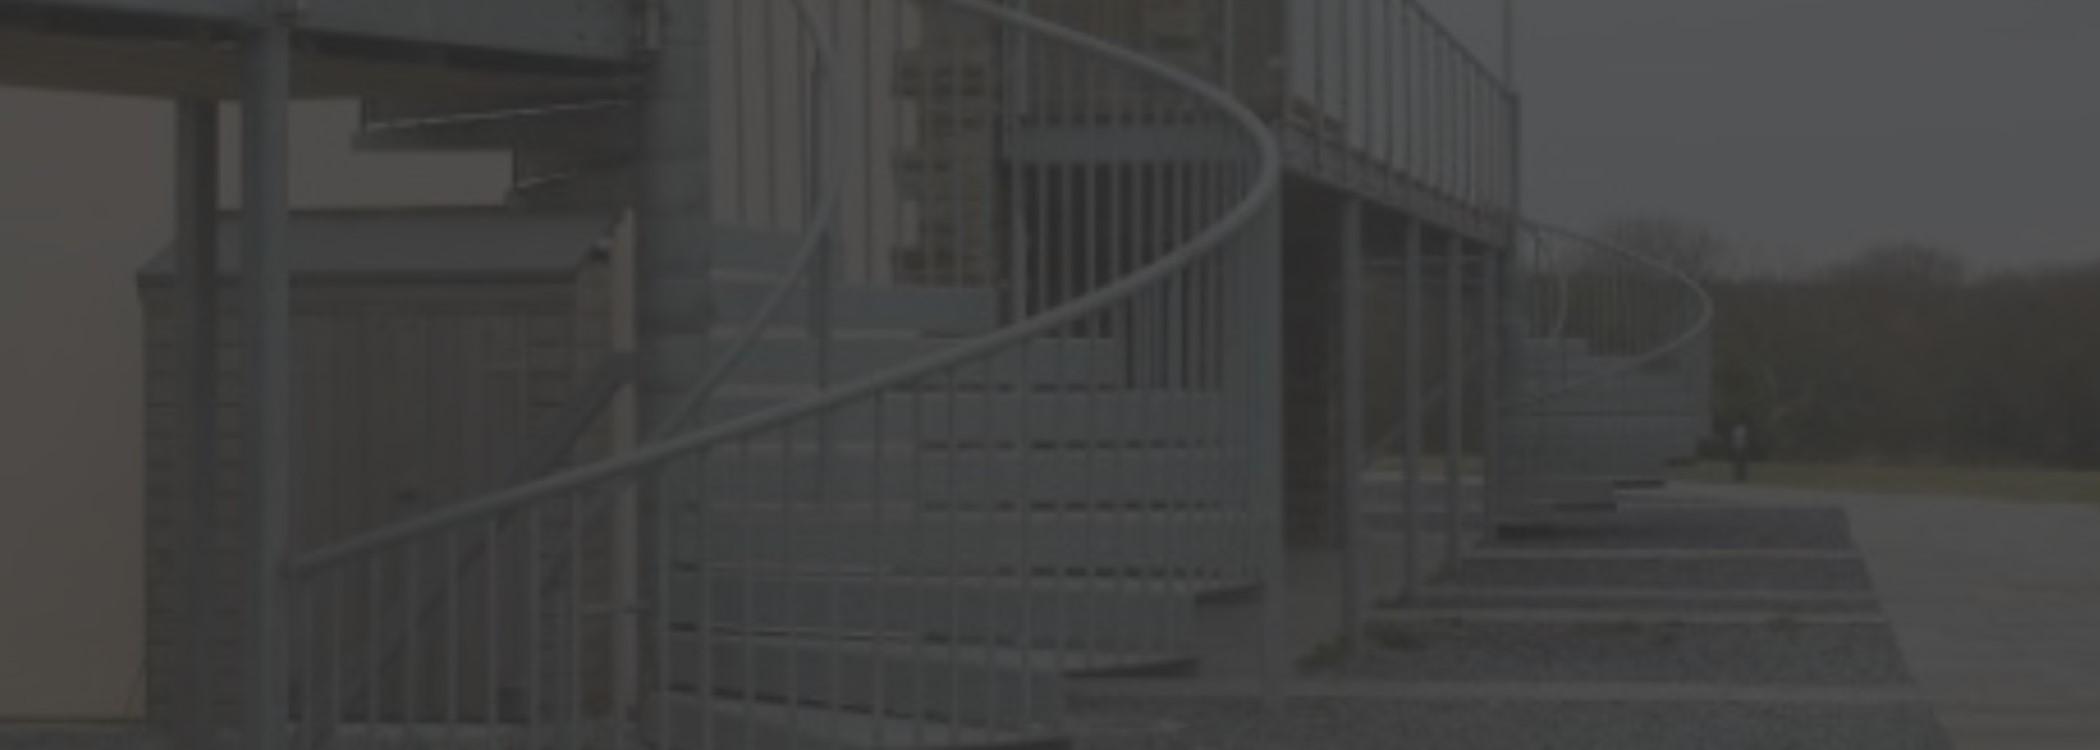 Retallack Spiral UK